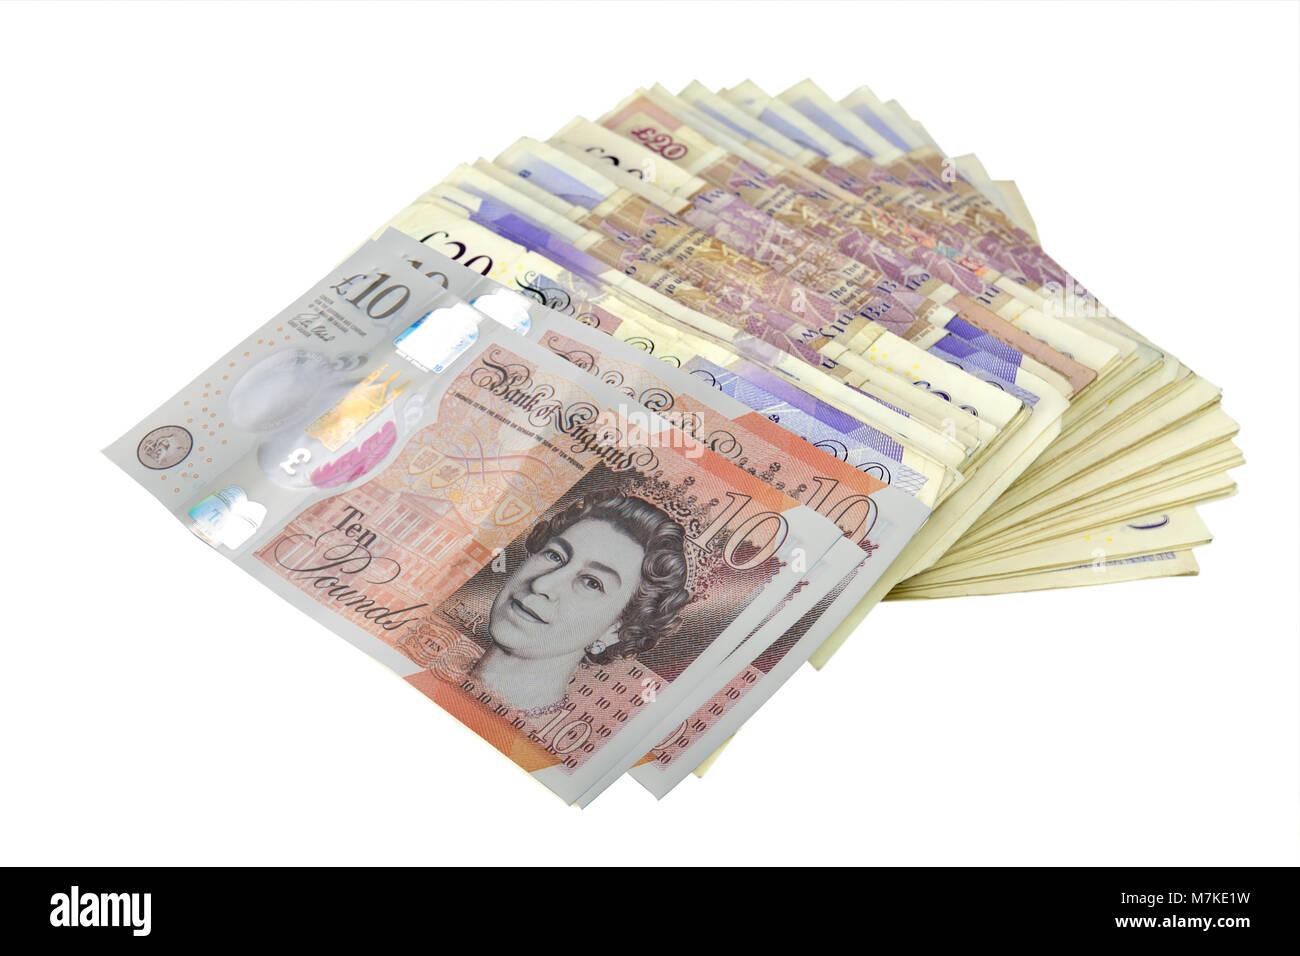 pile of British bank notes on white background - Stock Image